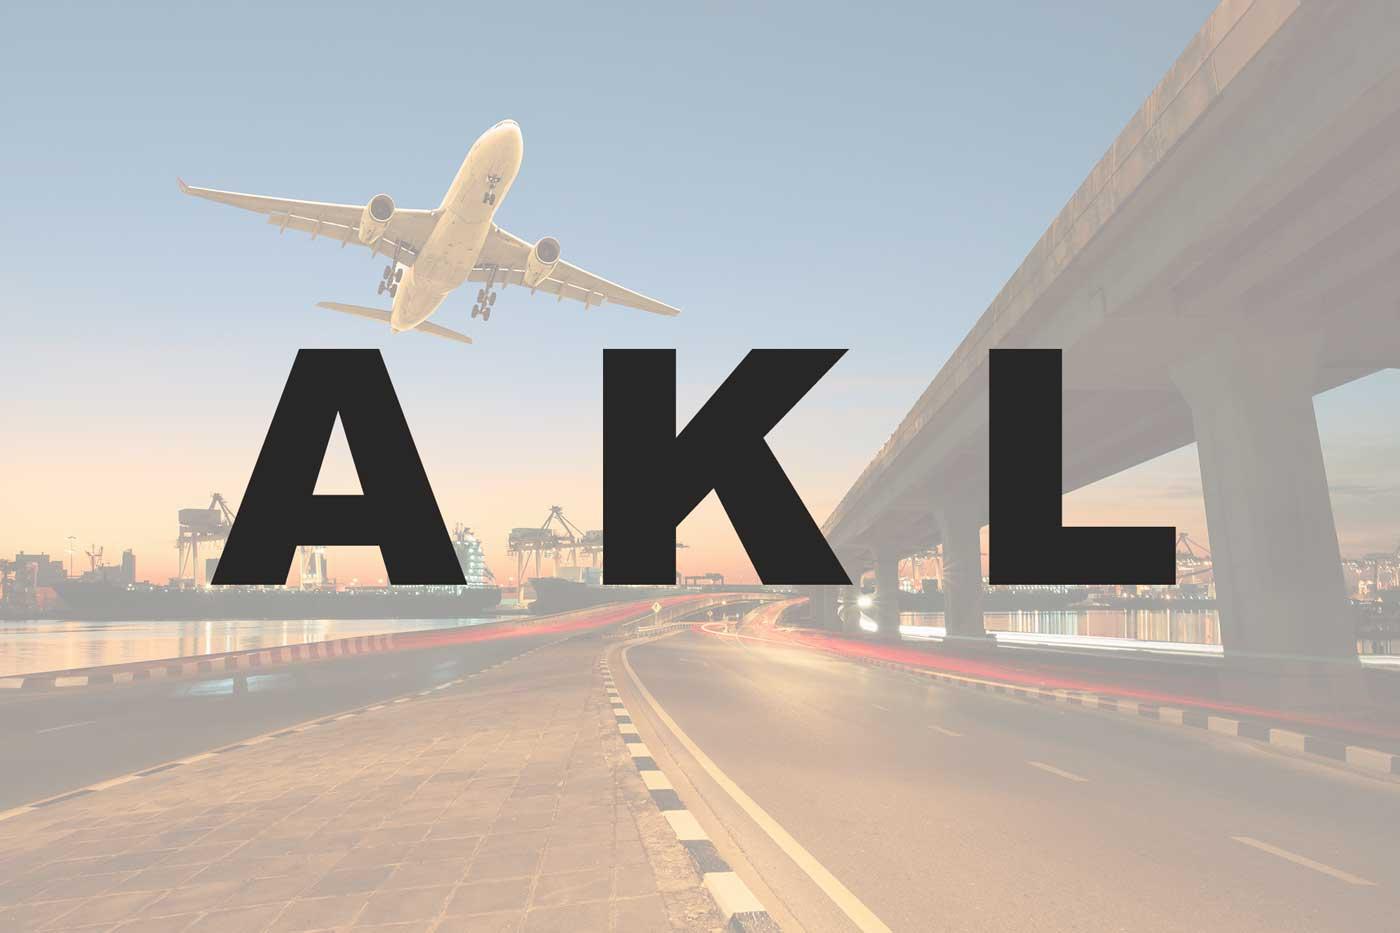 aeroport-auckland-akl